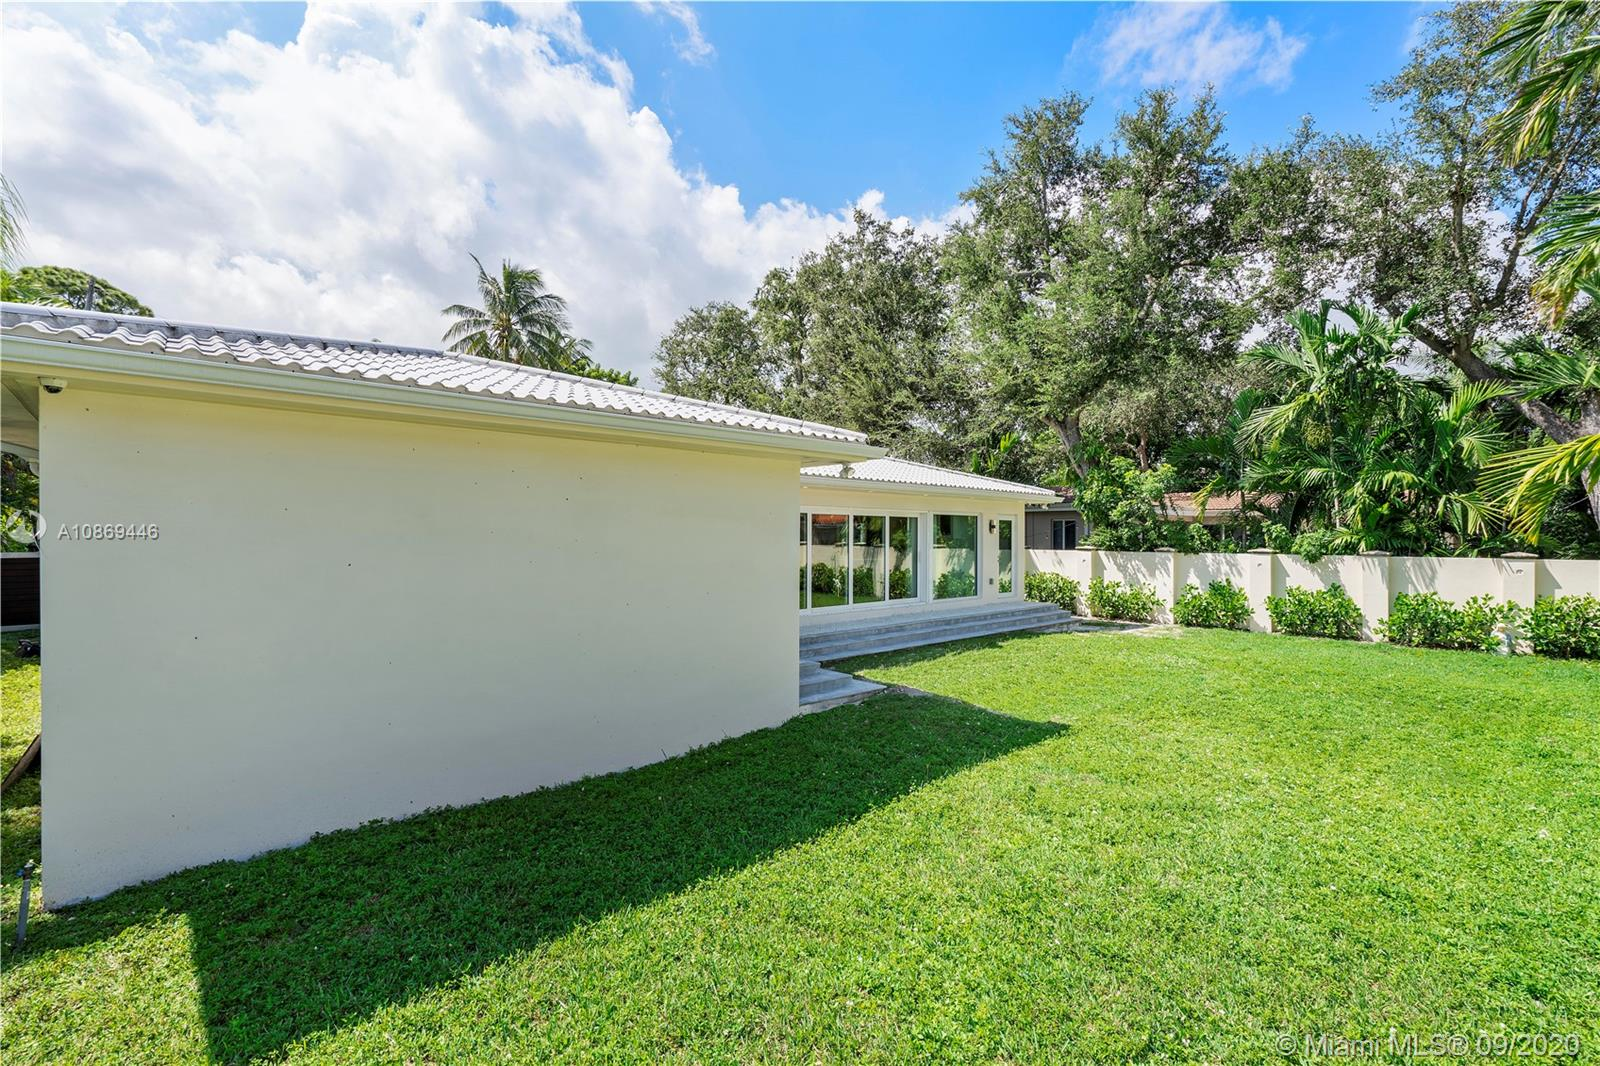 Miami Shores # - 57 - photo